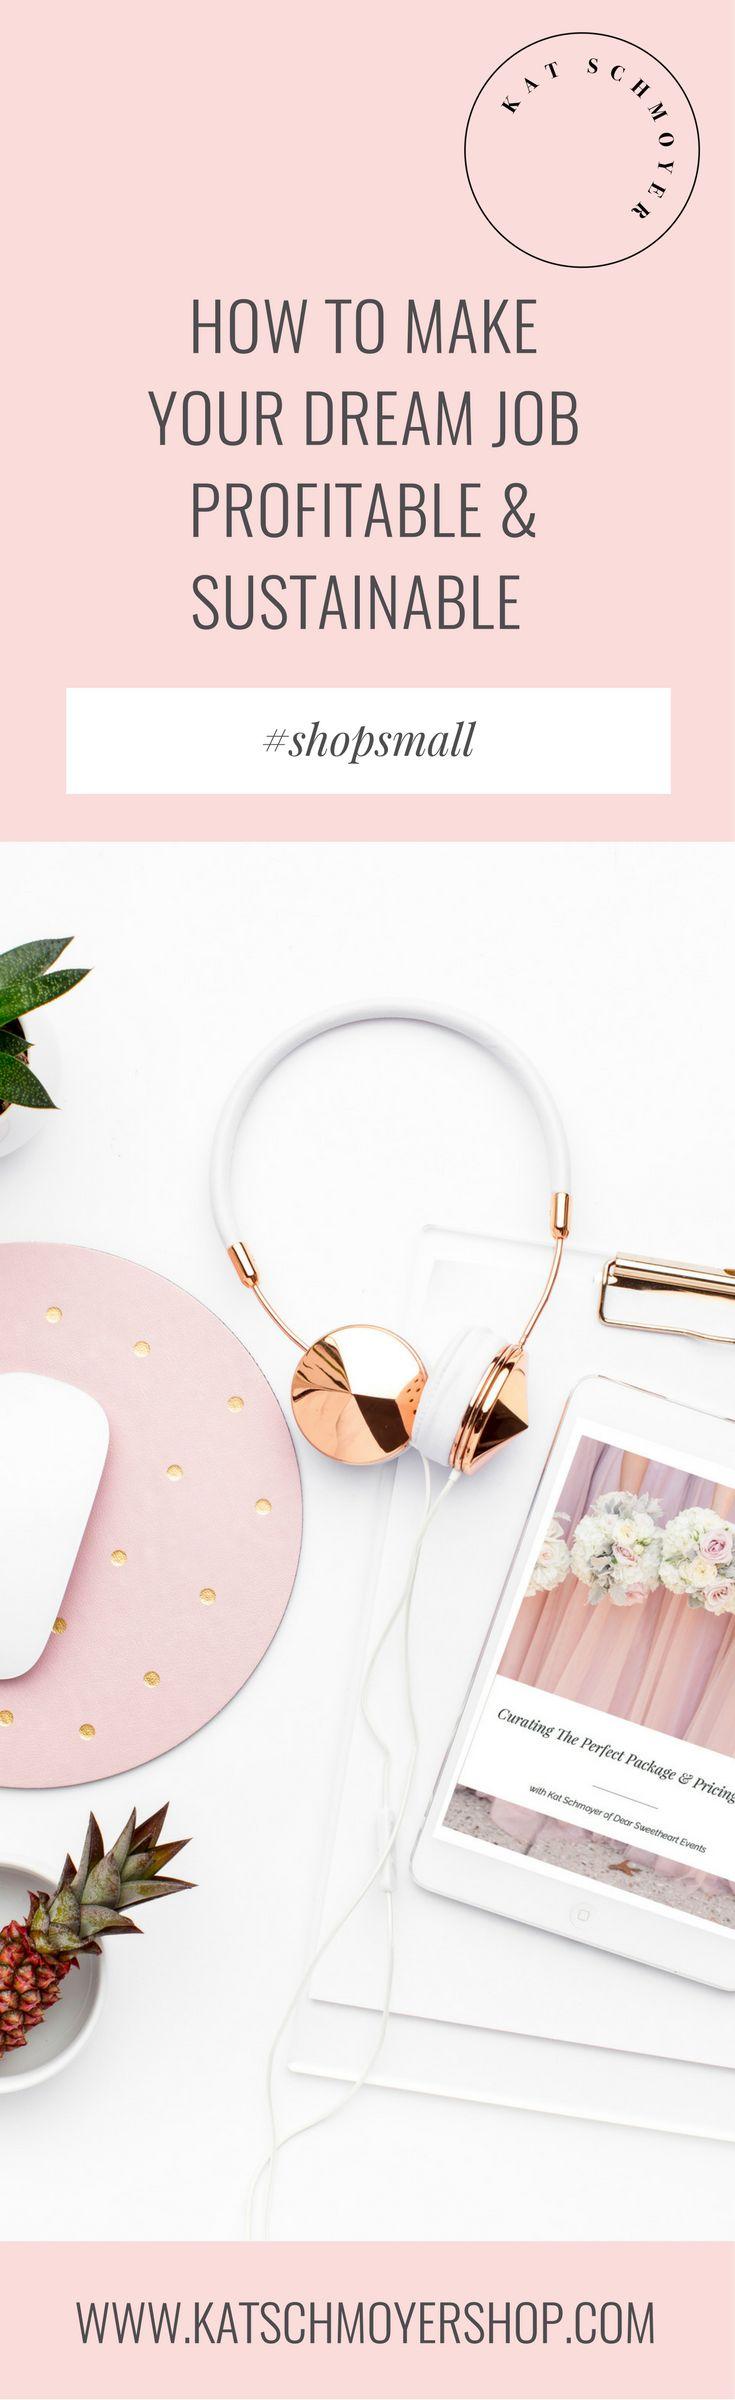 Products Designed to Make Your Dream Job Profitable & Sustainable // Kat Schmoyer Shop #shopsmall #shopsmallbusiness #creative #creativeentrepreneur #entrepreneur #sidehustler #weddingplanner #conference #conferencehost #bosslady